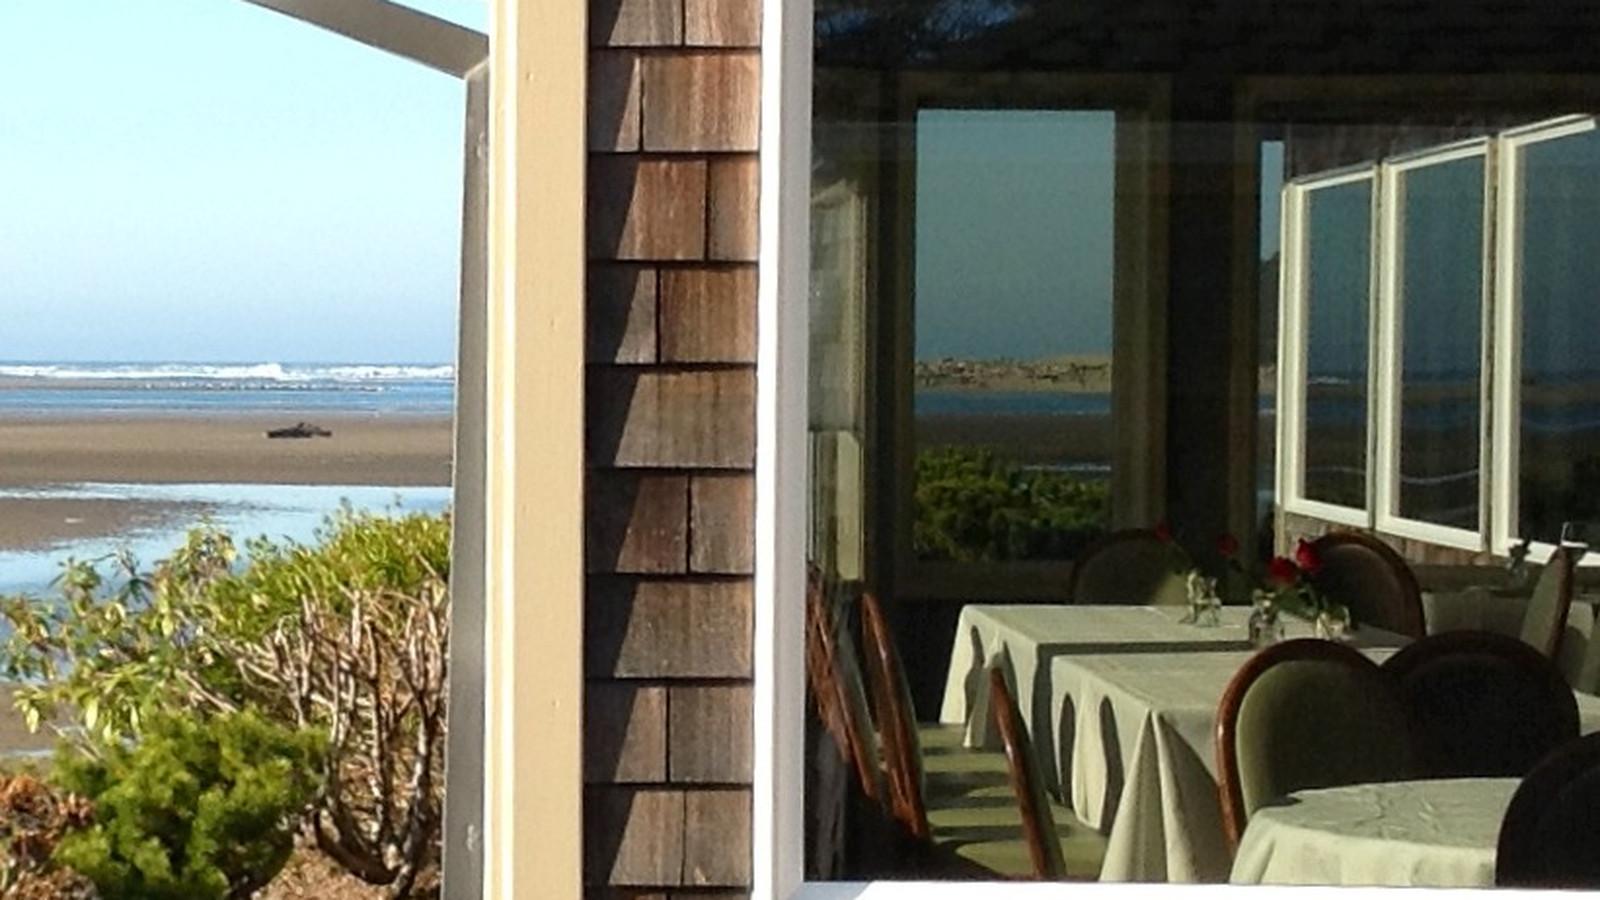 aaa snubs portland on 2015 best restaurants list eater portland. Black Bedroom Furniture Sets. Home Design Ideas